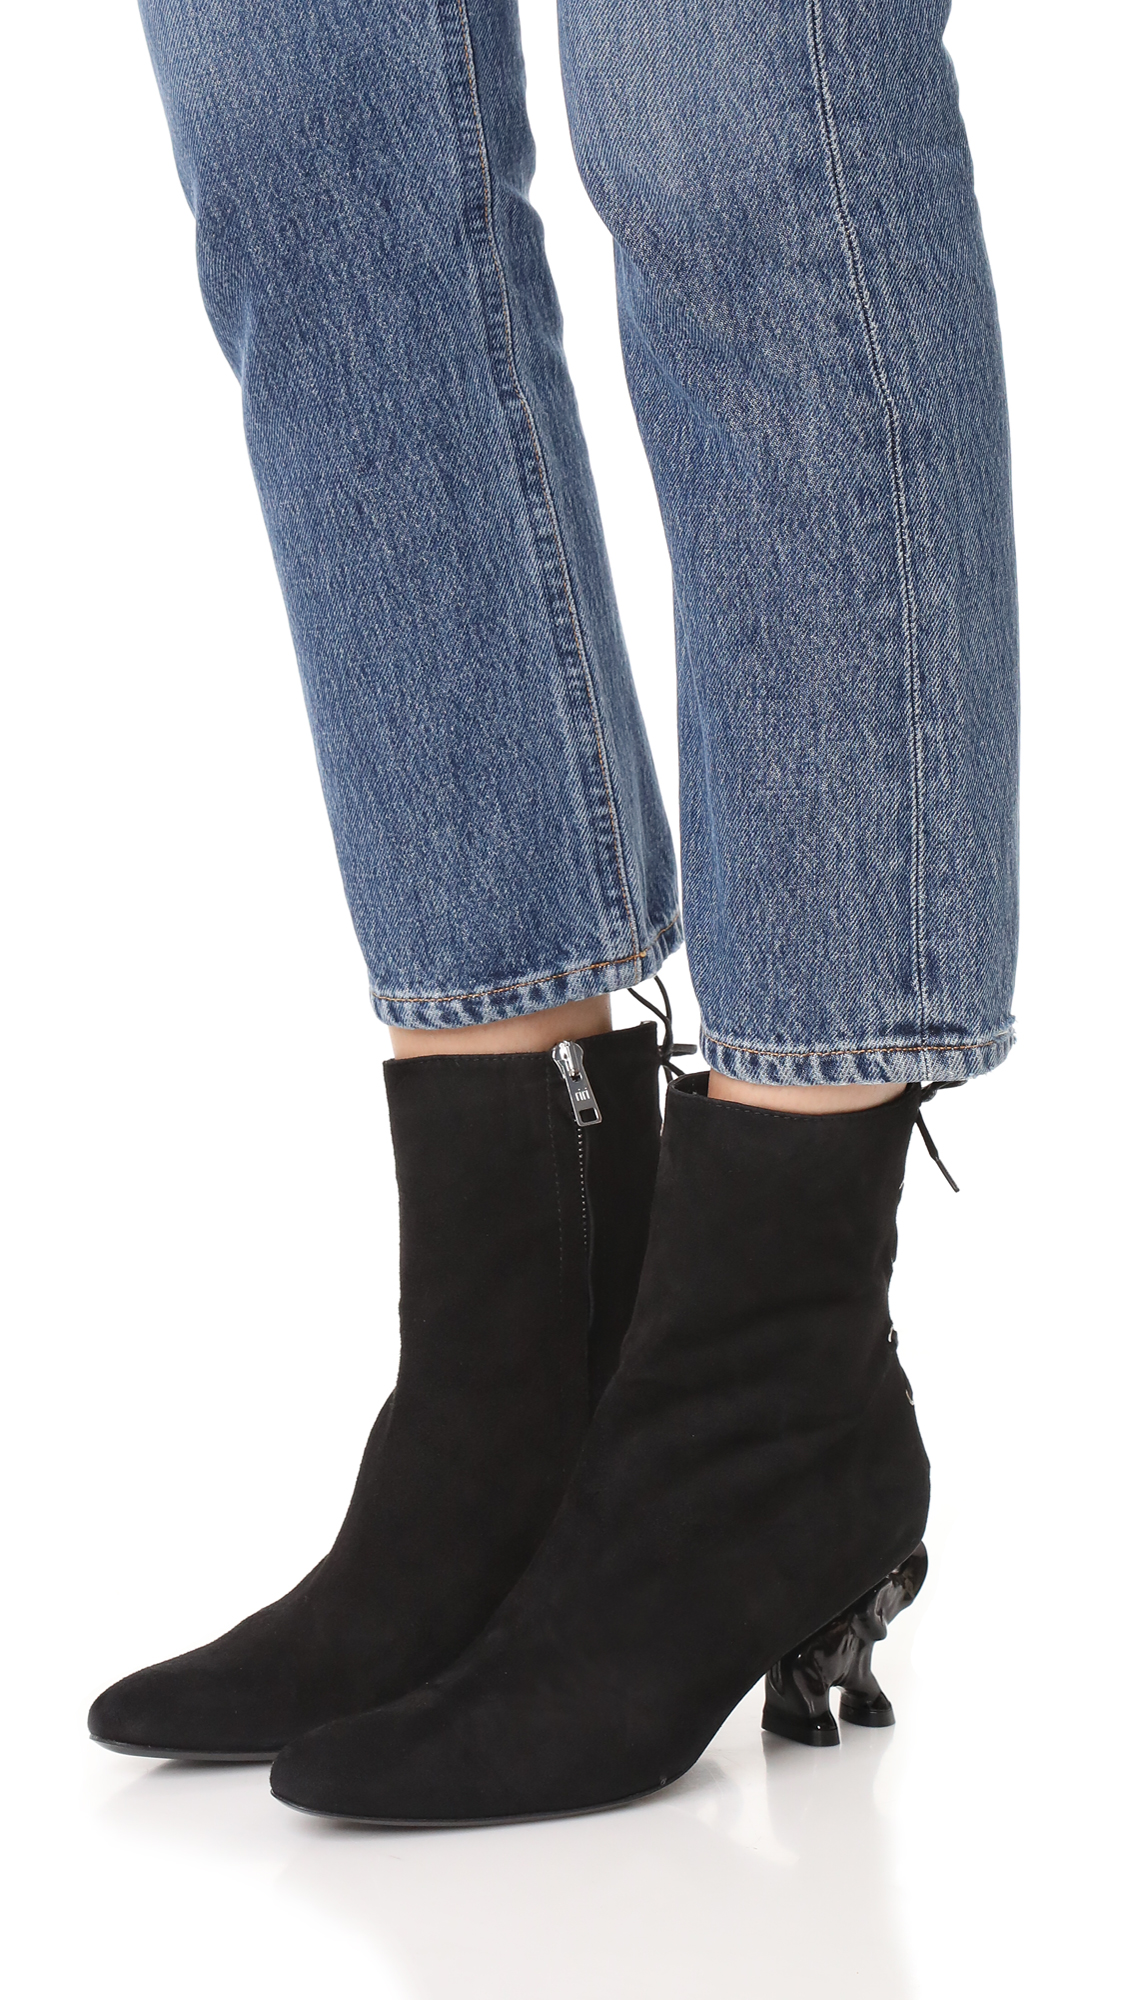 DORATEYMUR Elephant heel boots de054sEFgs